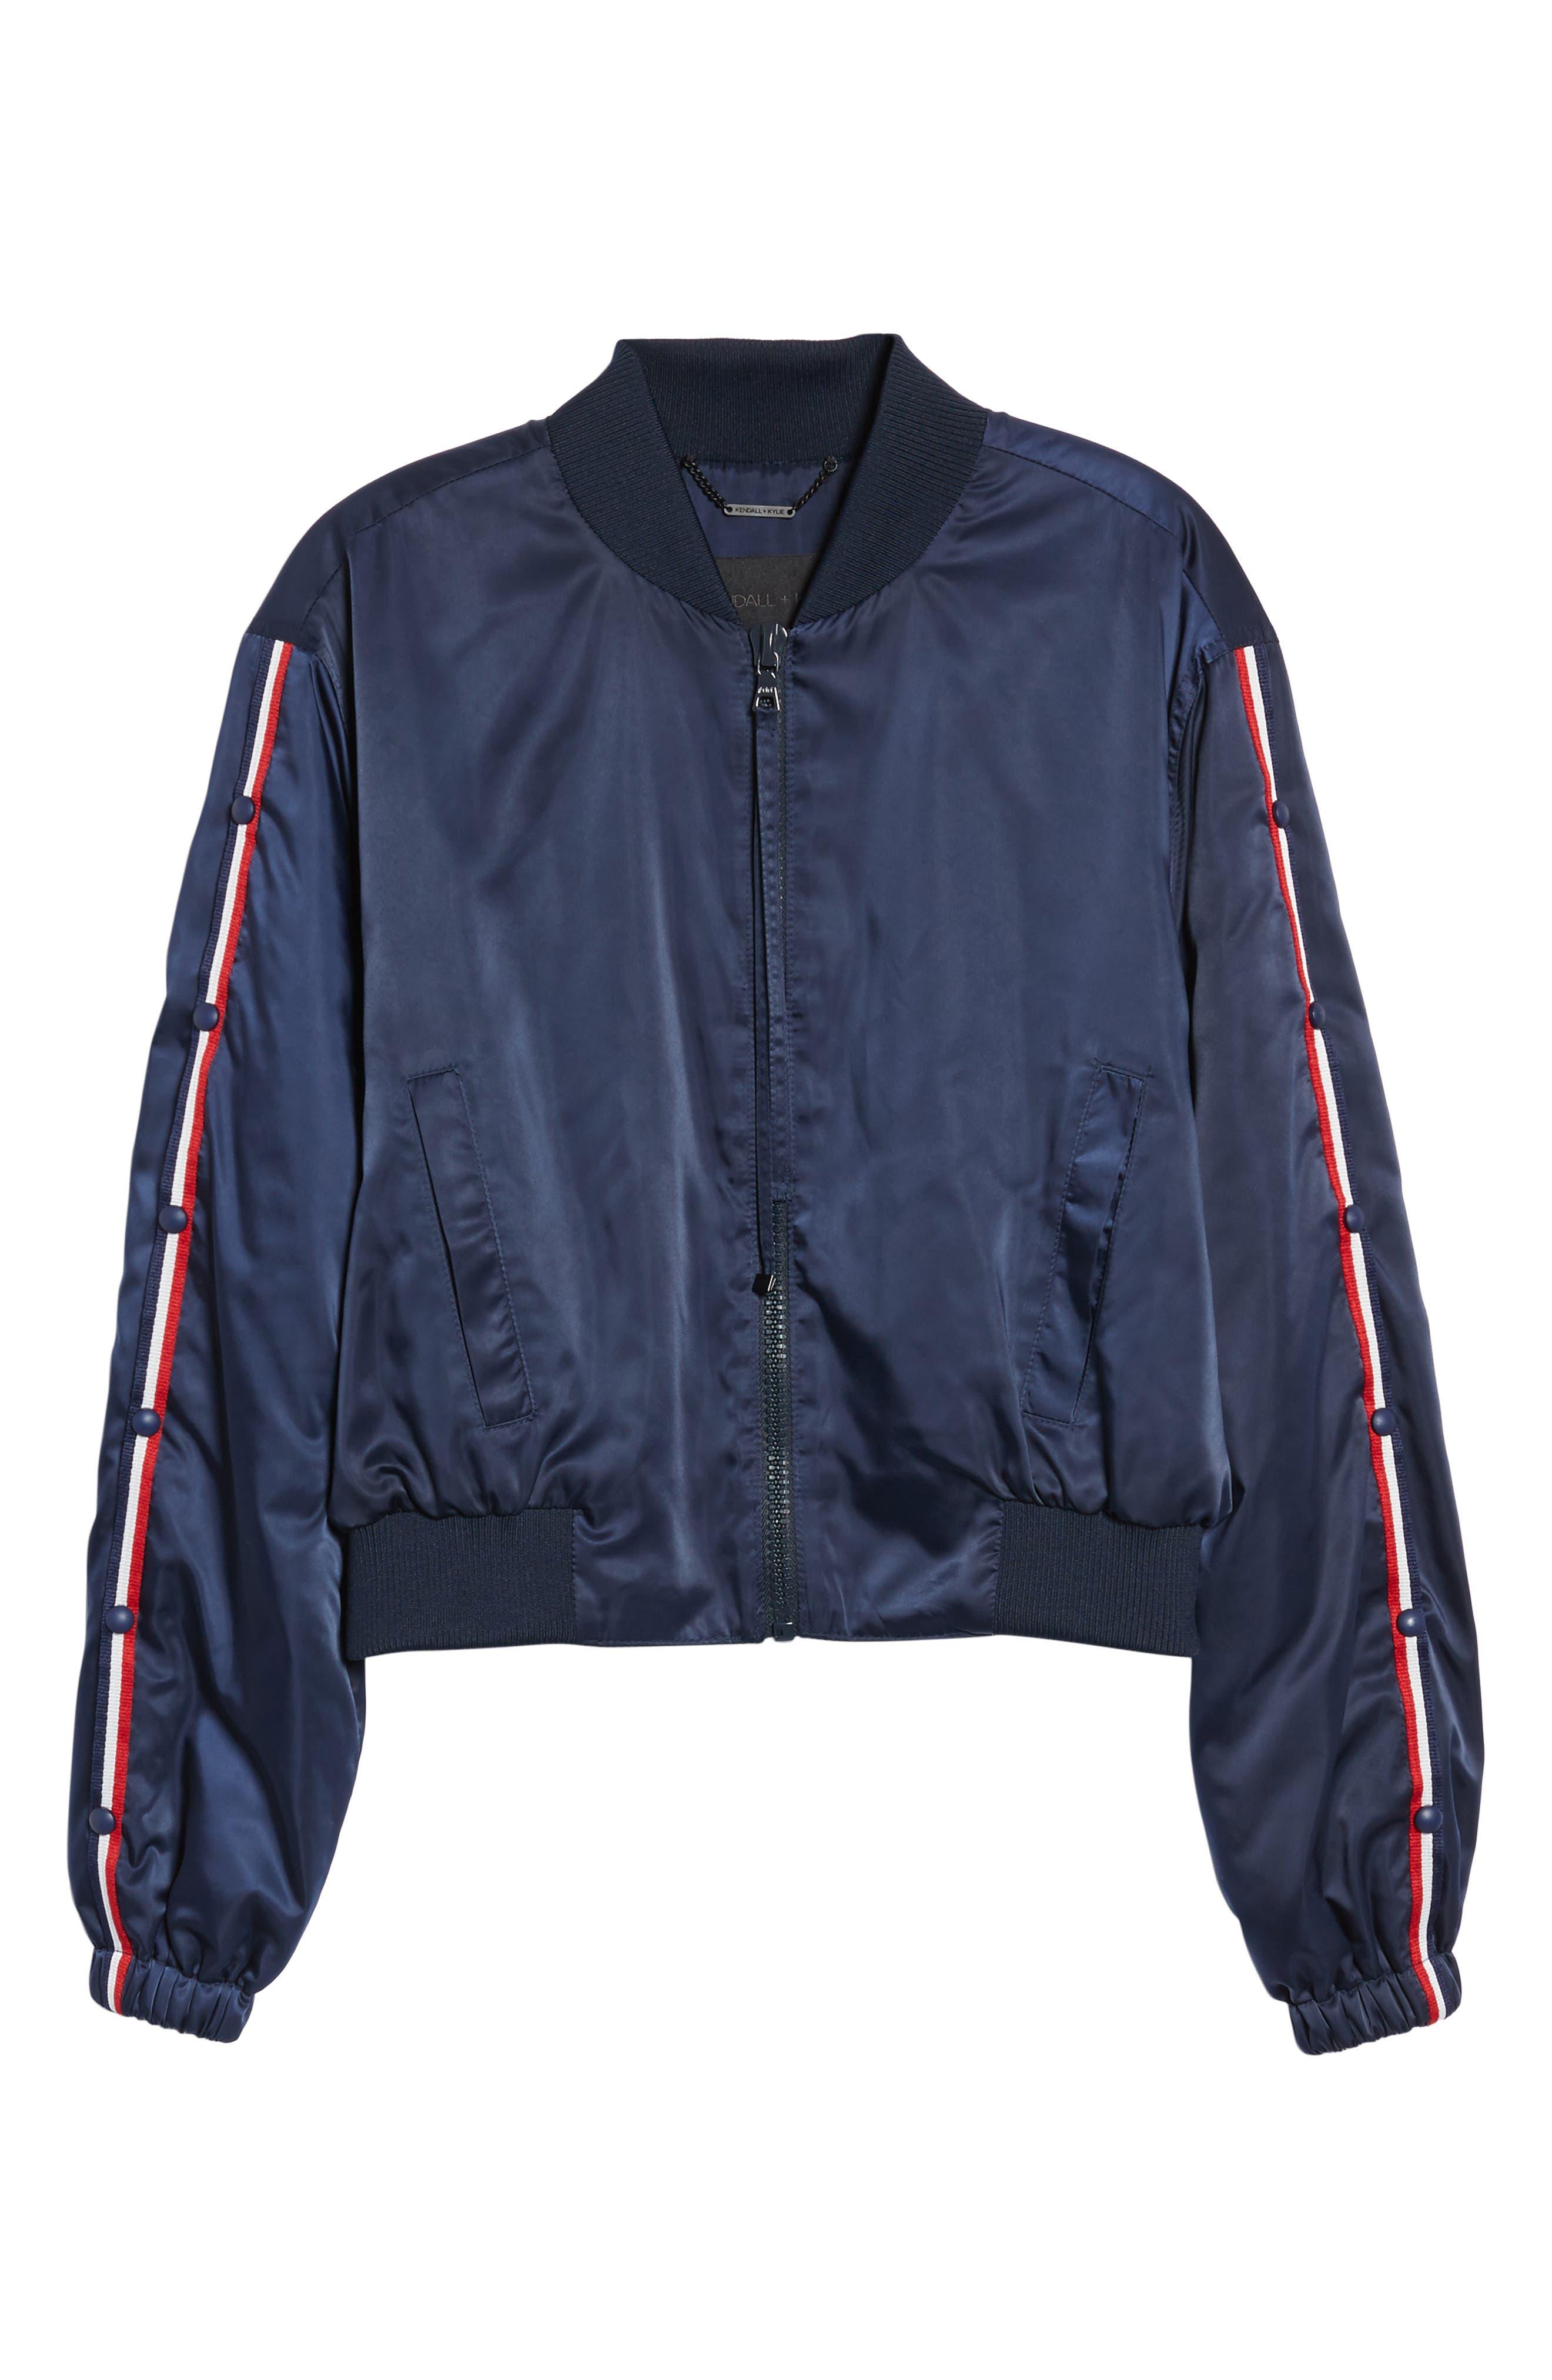 Bomber Jacket,                             Alternate thumbnail 5, color,                             410